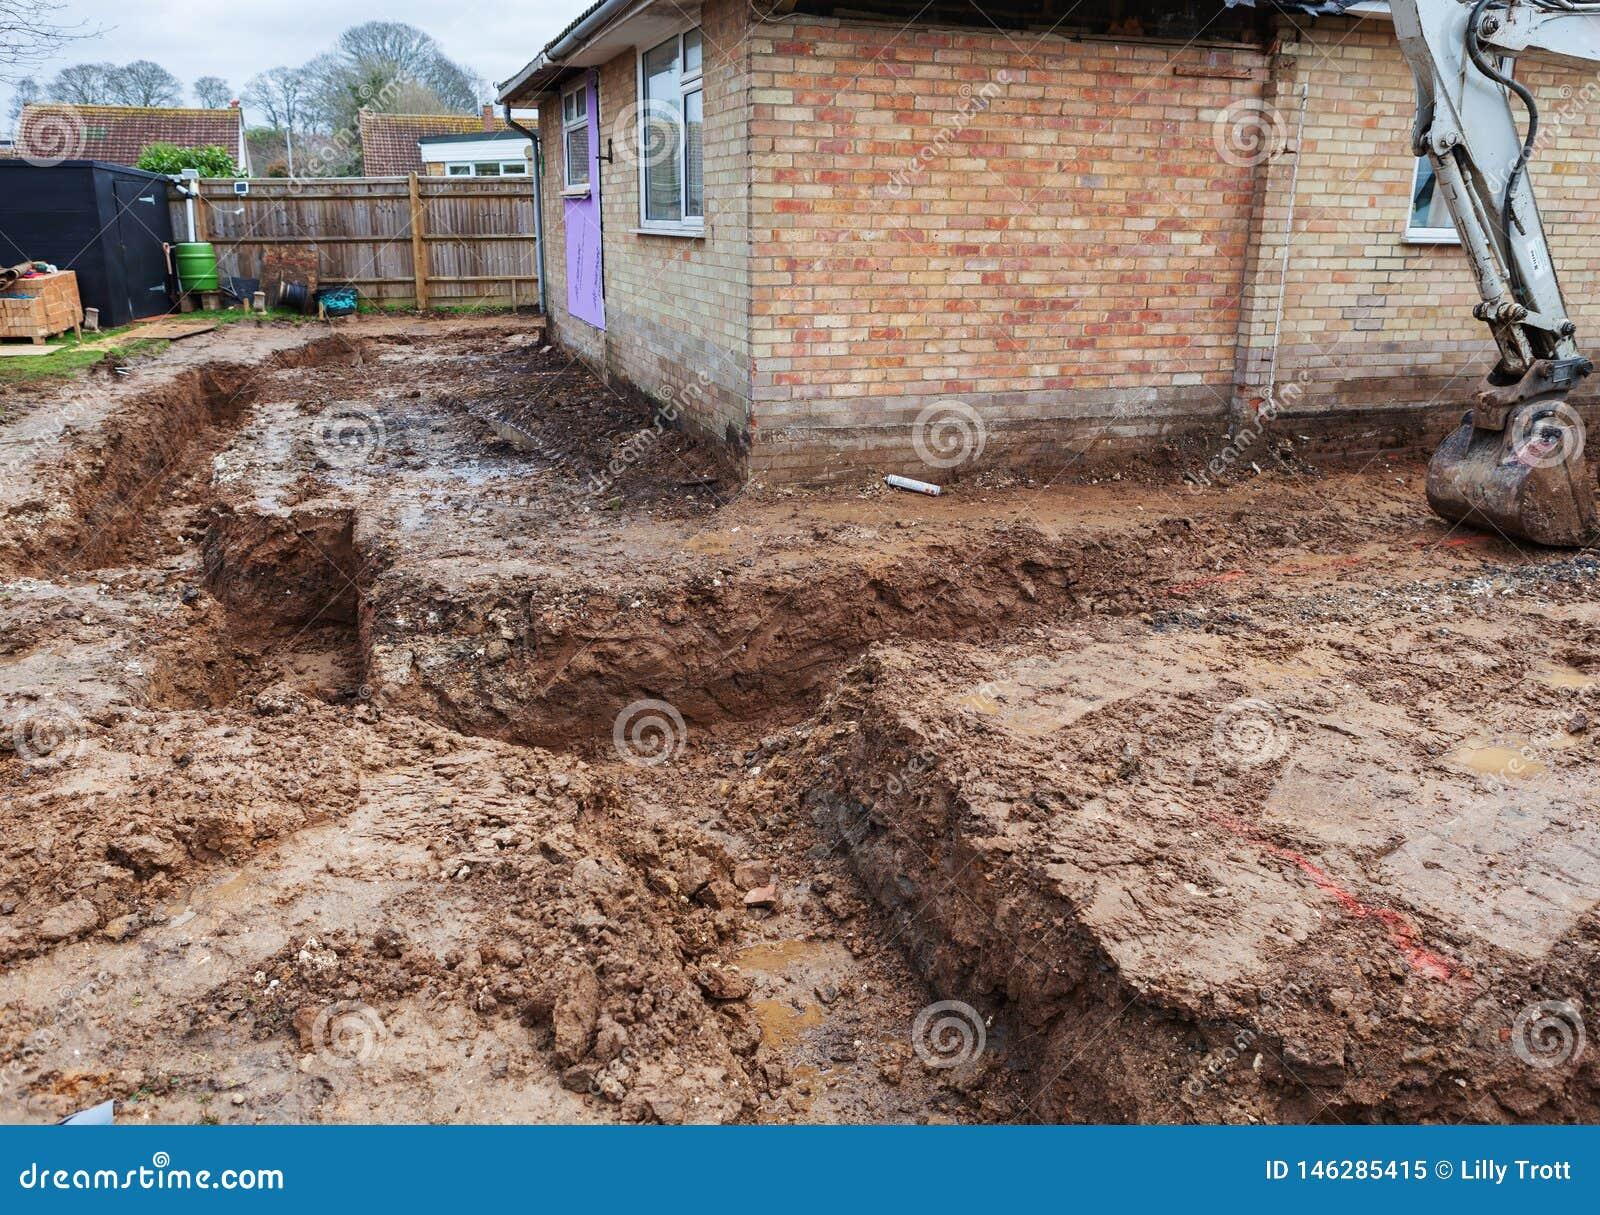 Dug foundations